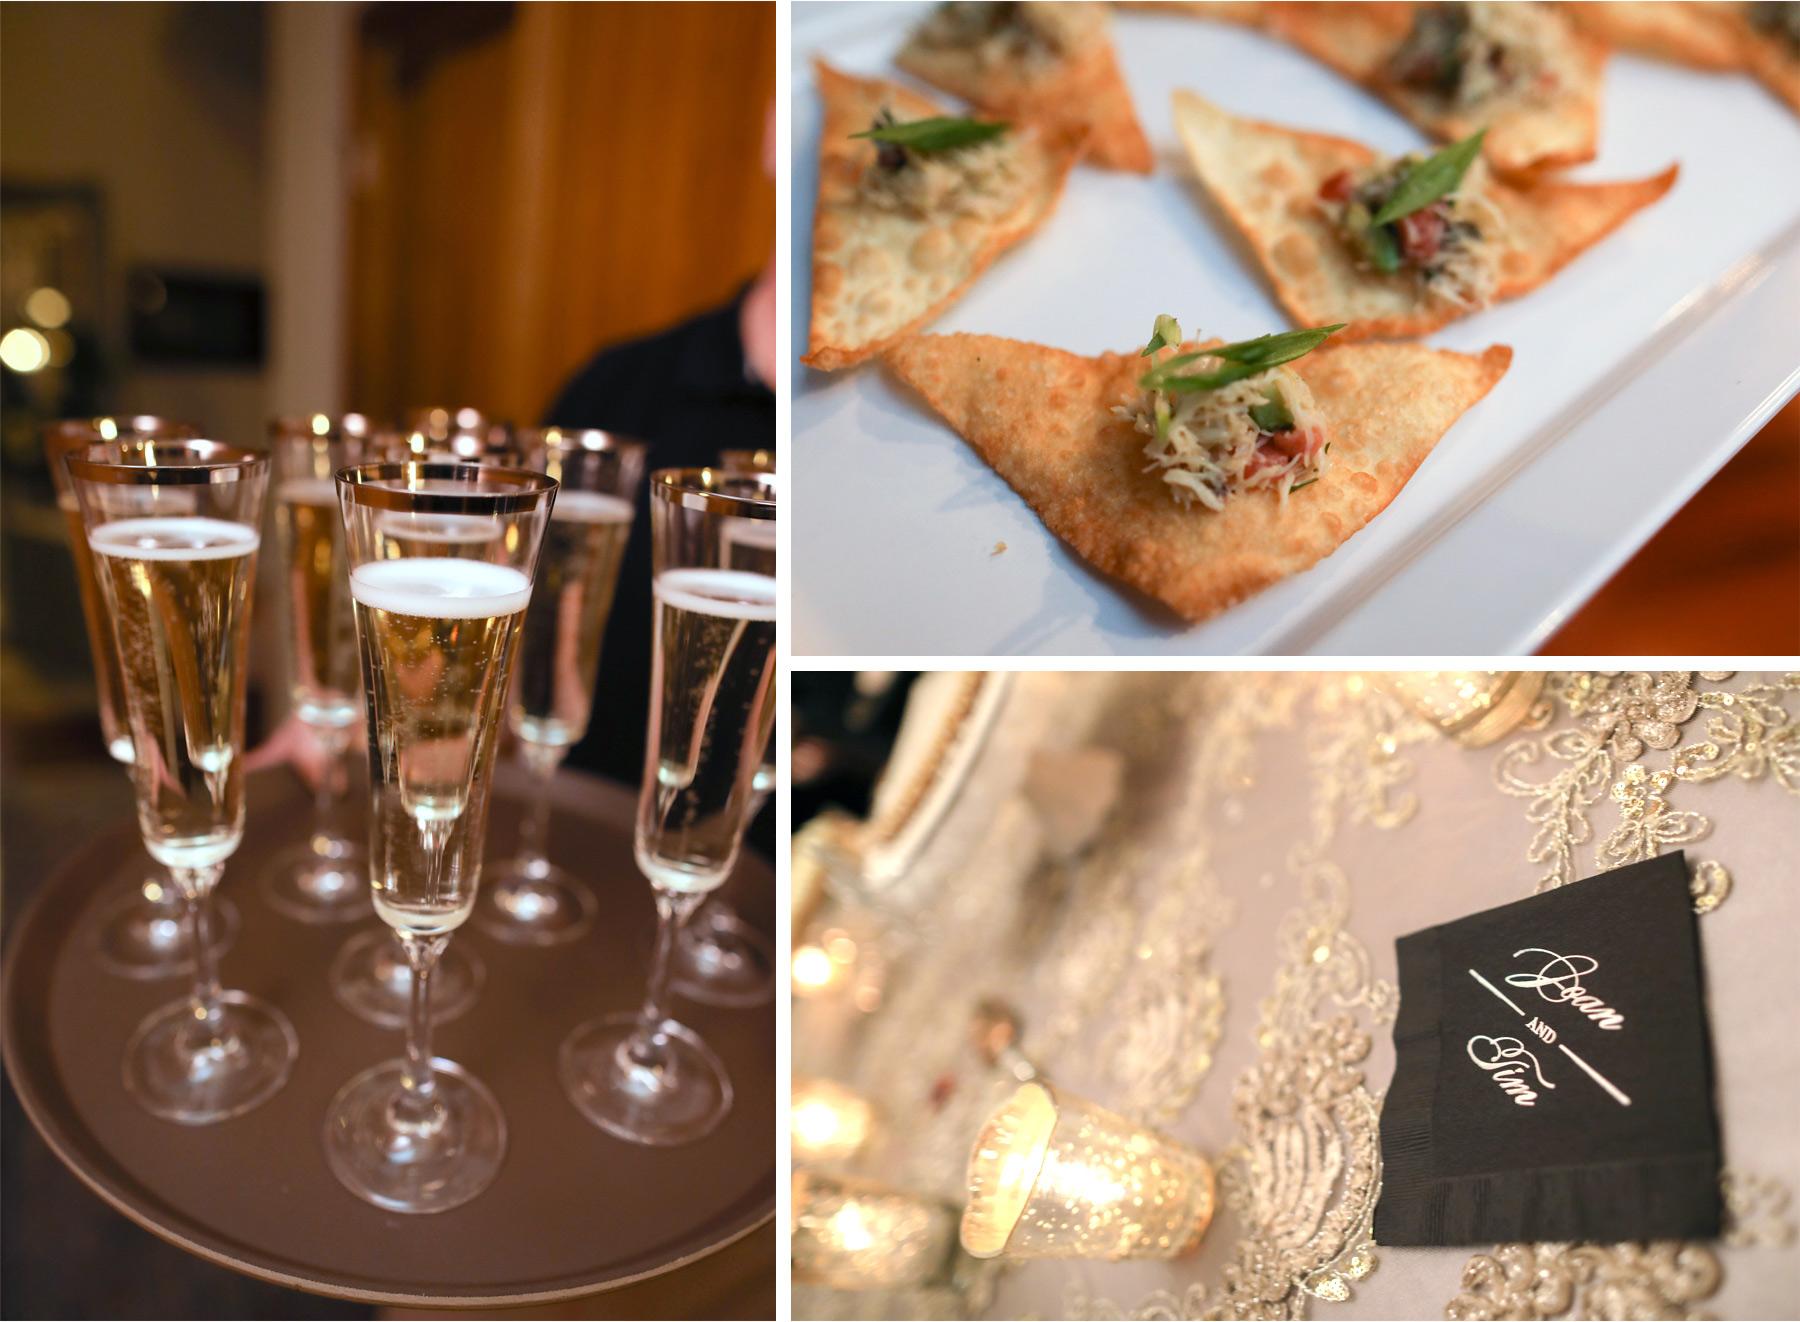 05-Minneapolis-Minnesota-Wedding-Photography-by-Vick-Photography-Loews-Hotel-Champagne-Table-Decor-Starters-Joan-and-Tim.jpg